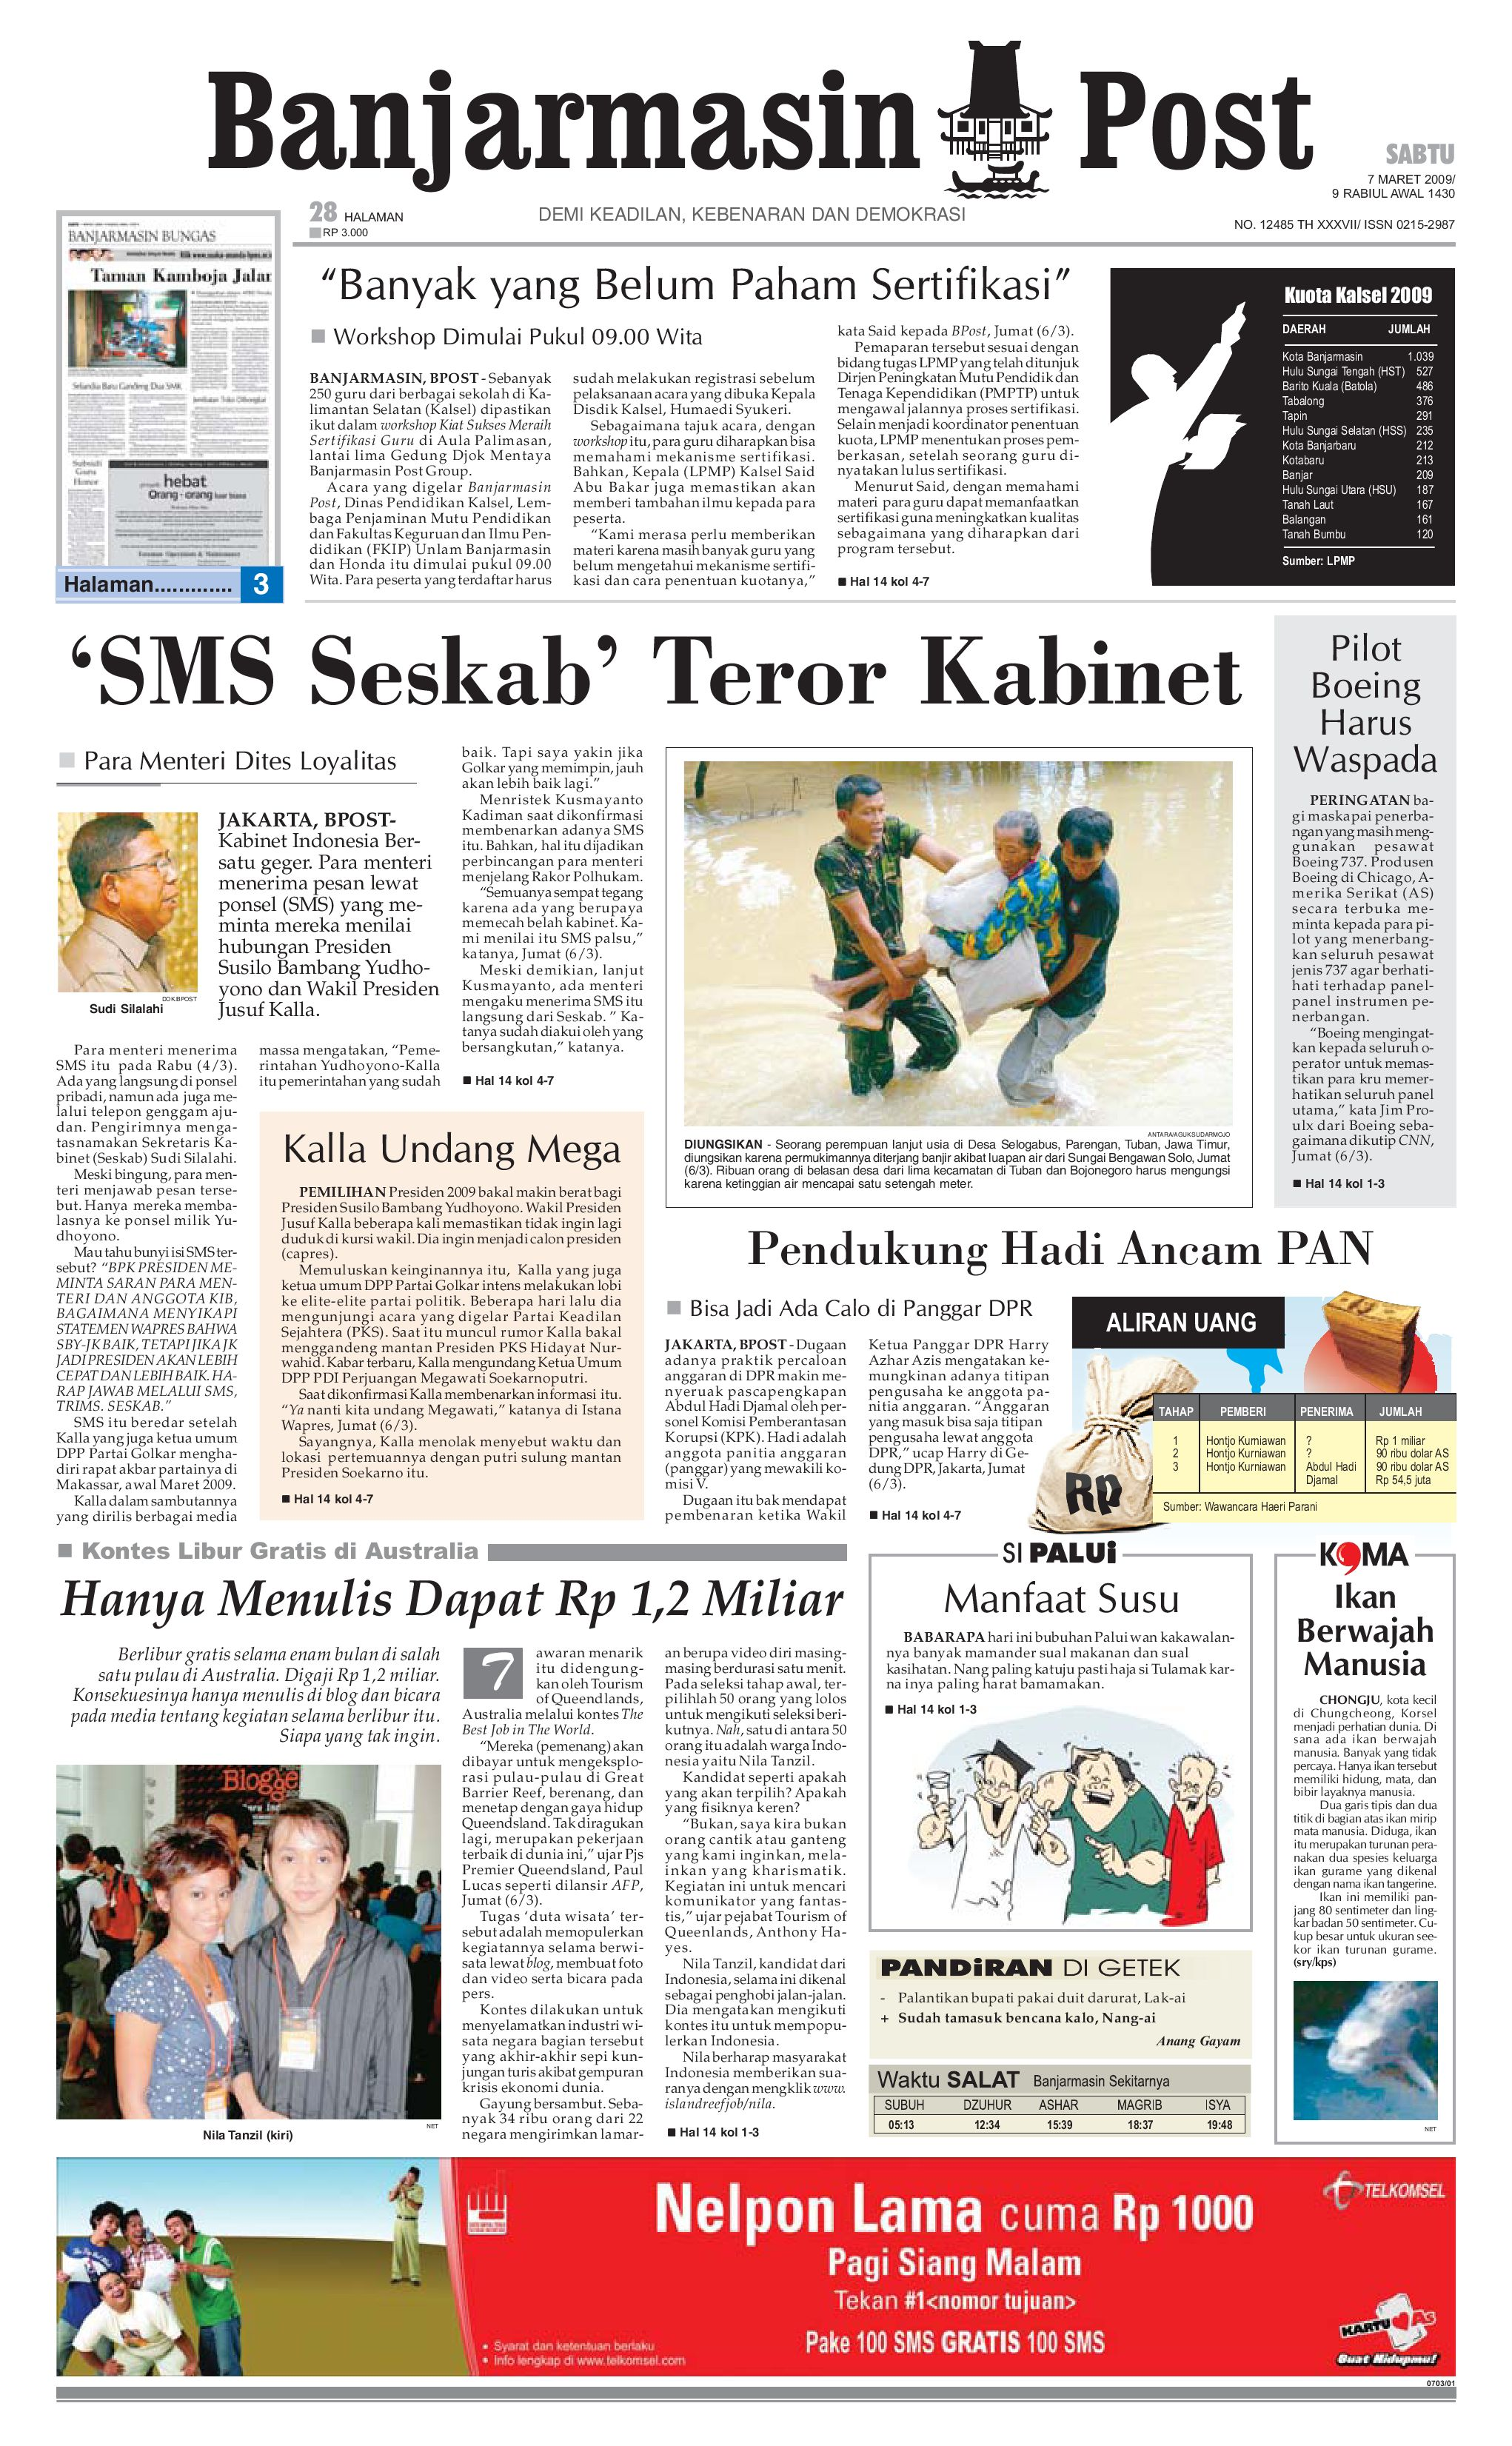 Banjarmasin Post 7 Maret 2009 By Issuu Nature Pecinta Voucher Hypermart 50000 Alam